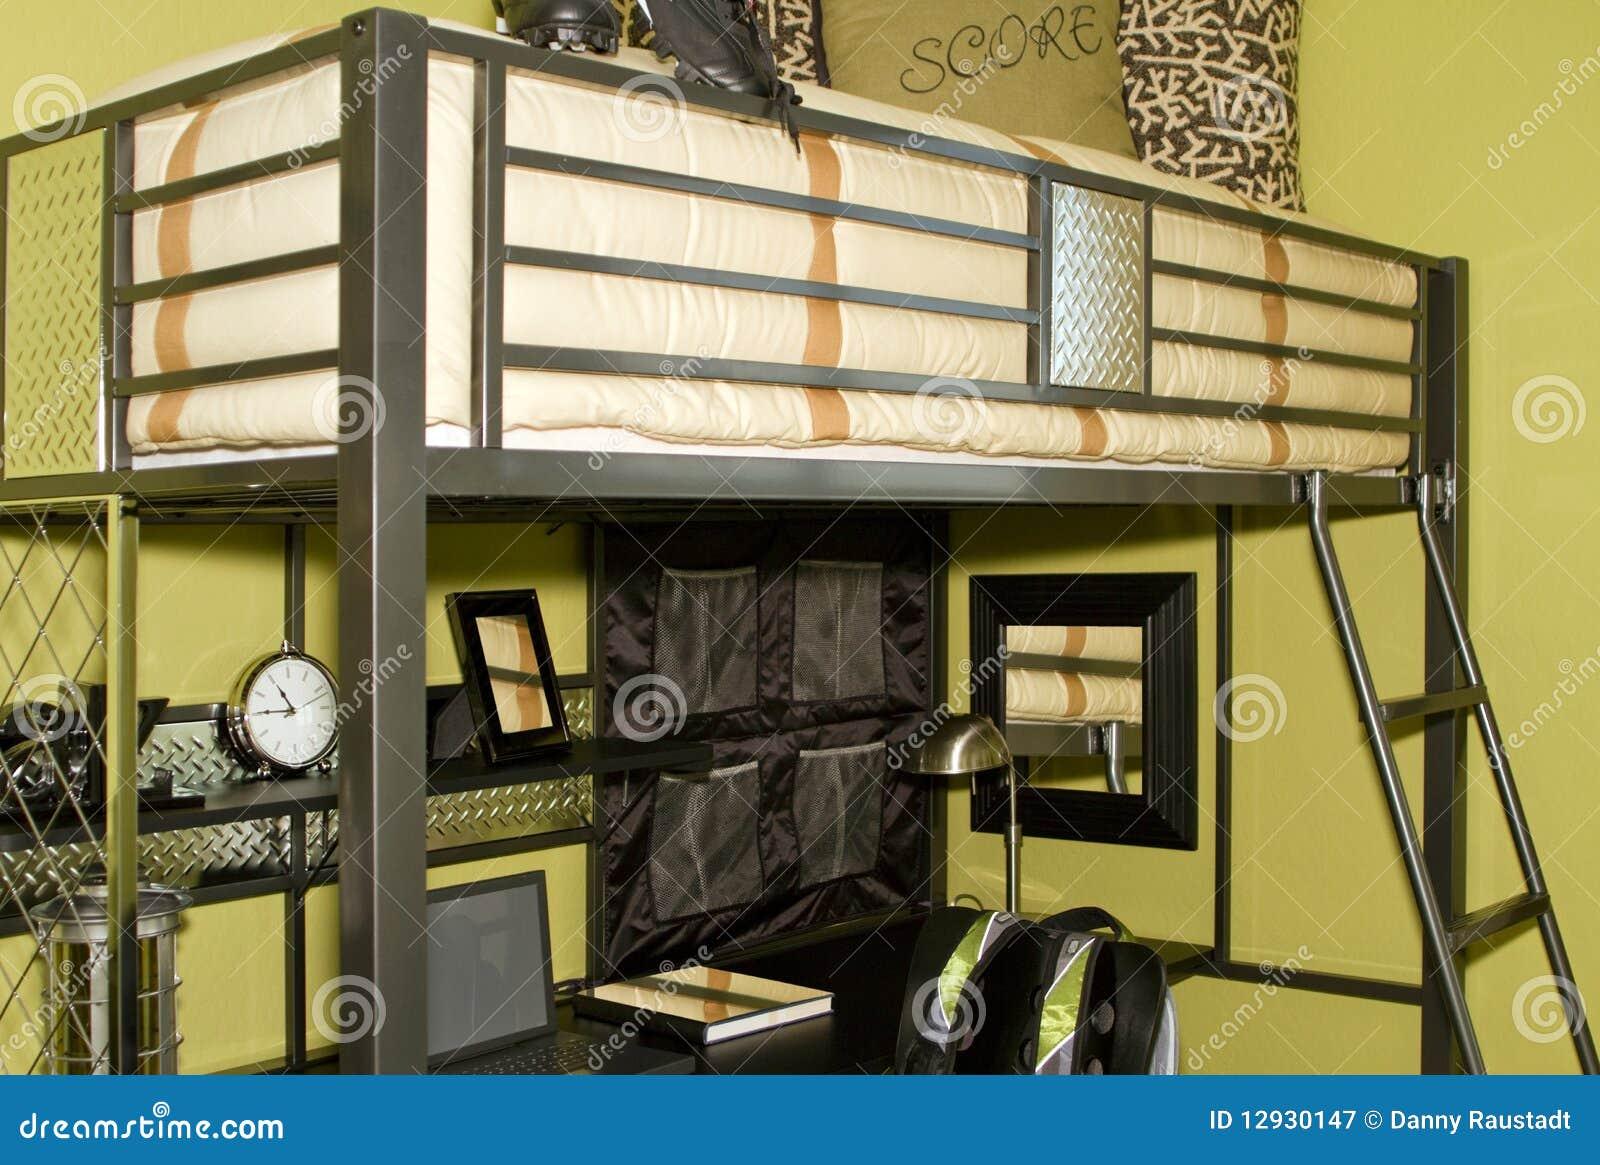 Quarto adulto novo com cama de beliche fotografia de stock royalty free imagem 12930147 - Decoratie slaapkamer volwassen fotos ...